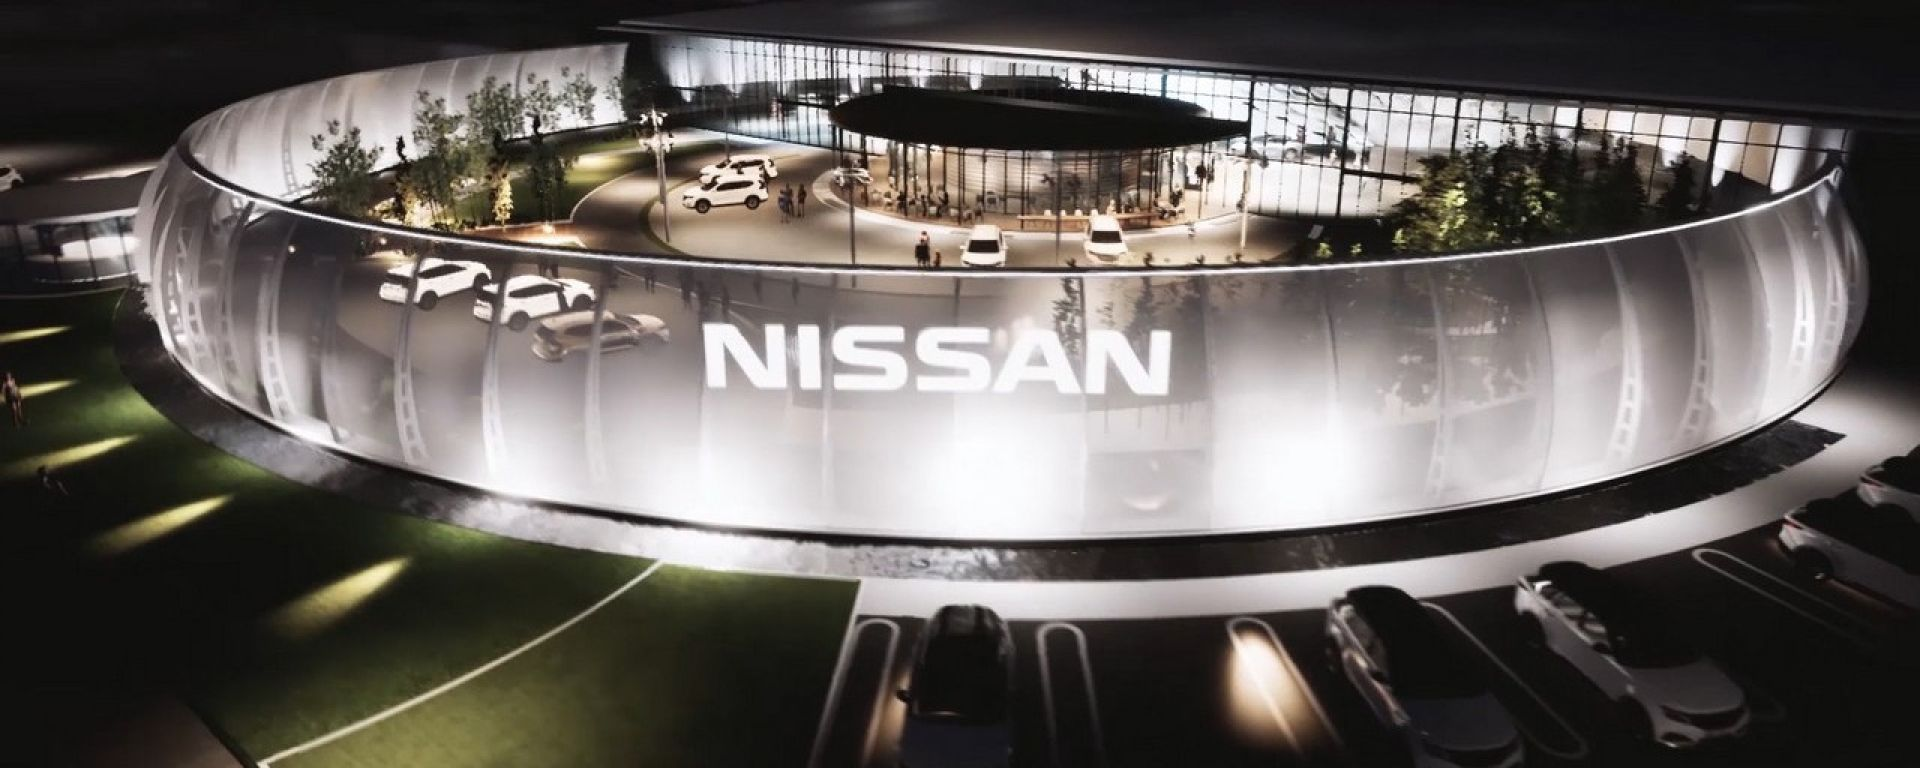 Il Nissan Pavillion di Yokohama